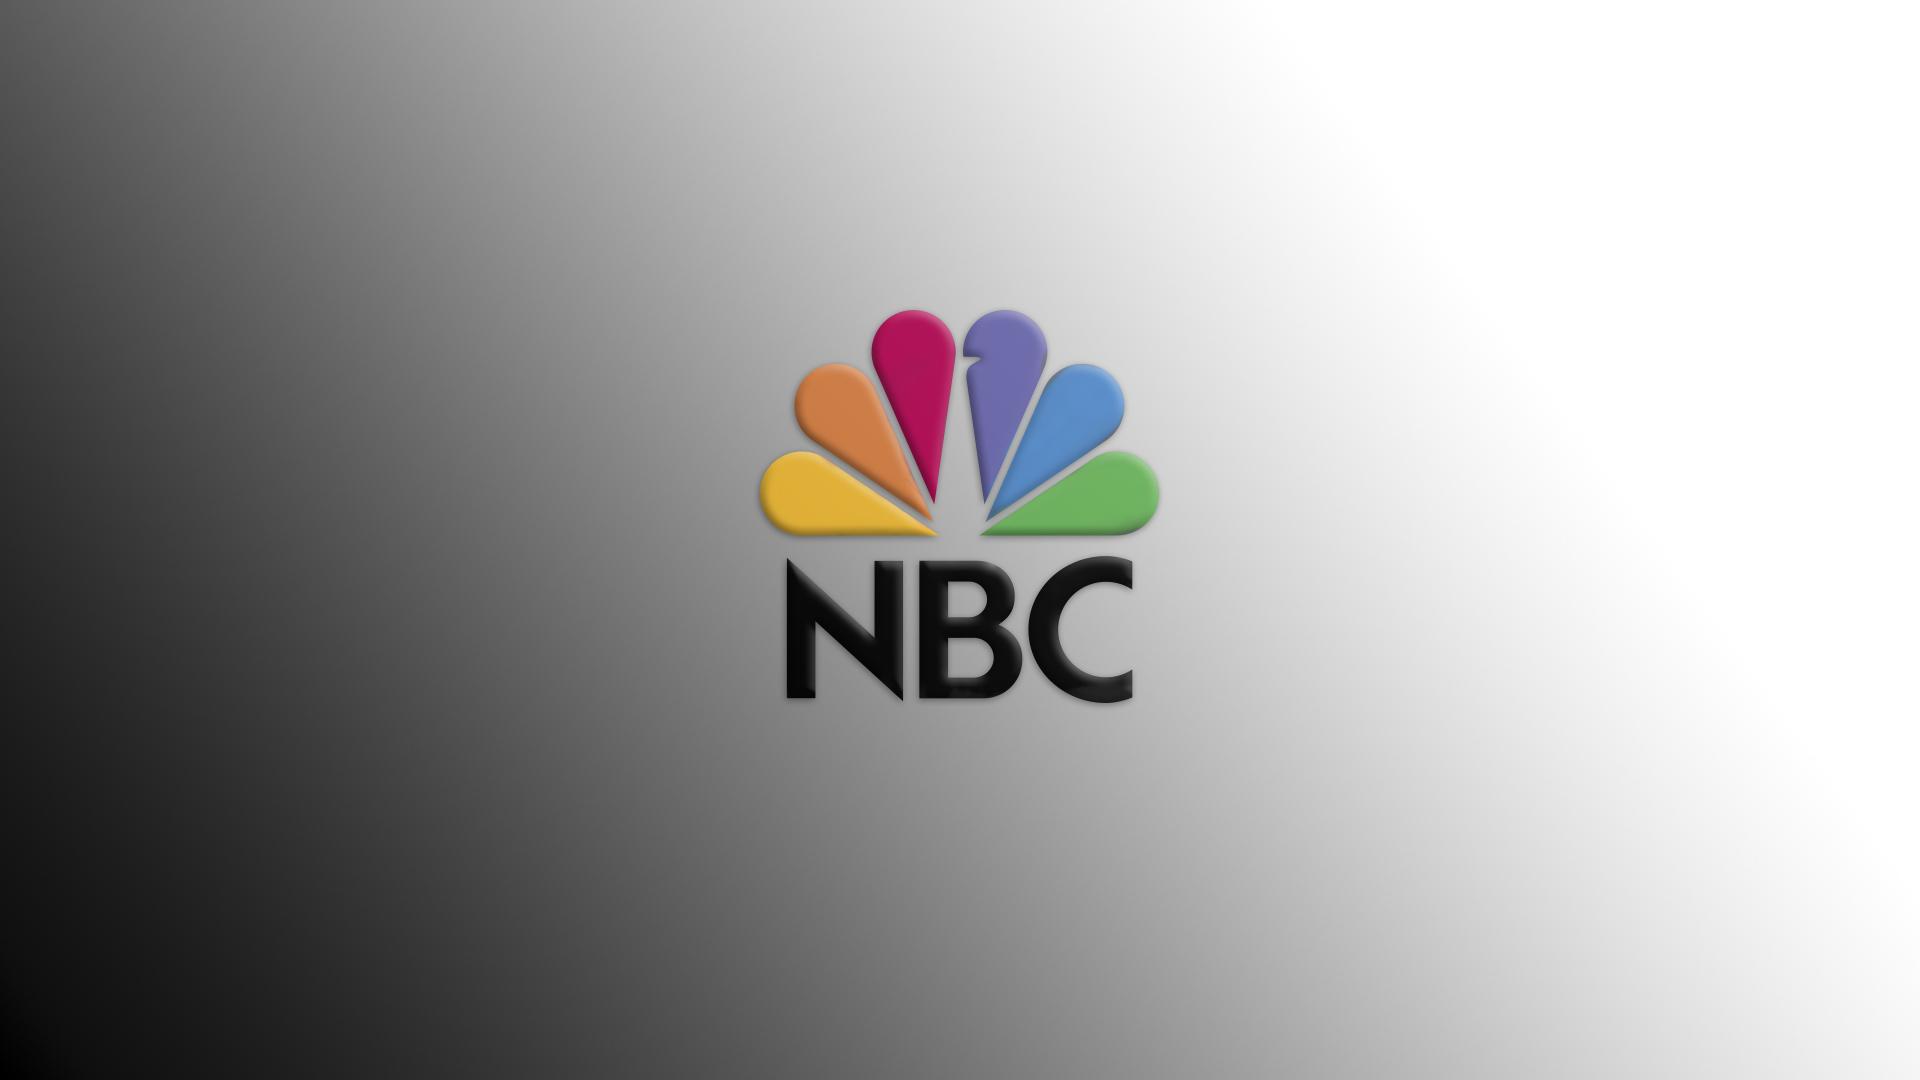 NBC LOGO9.jpg